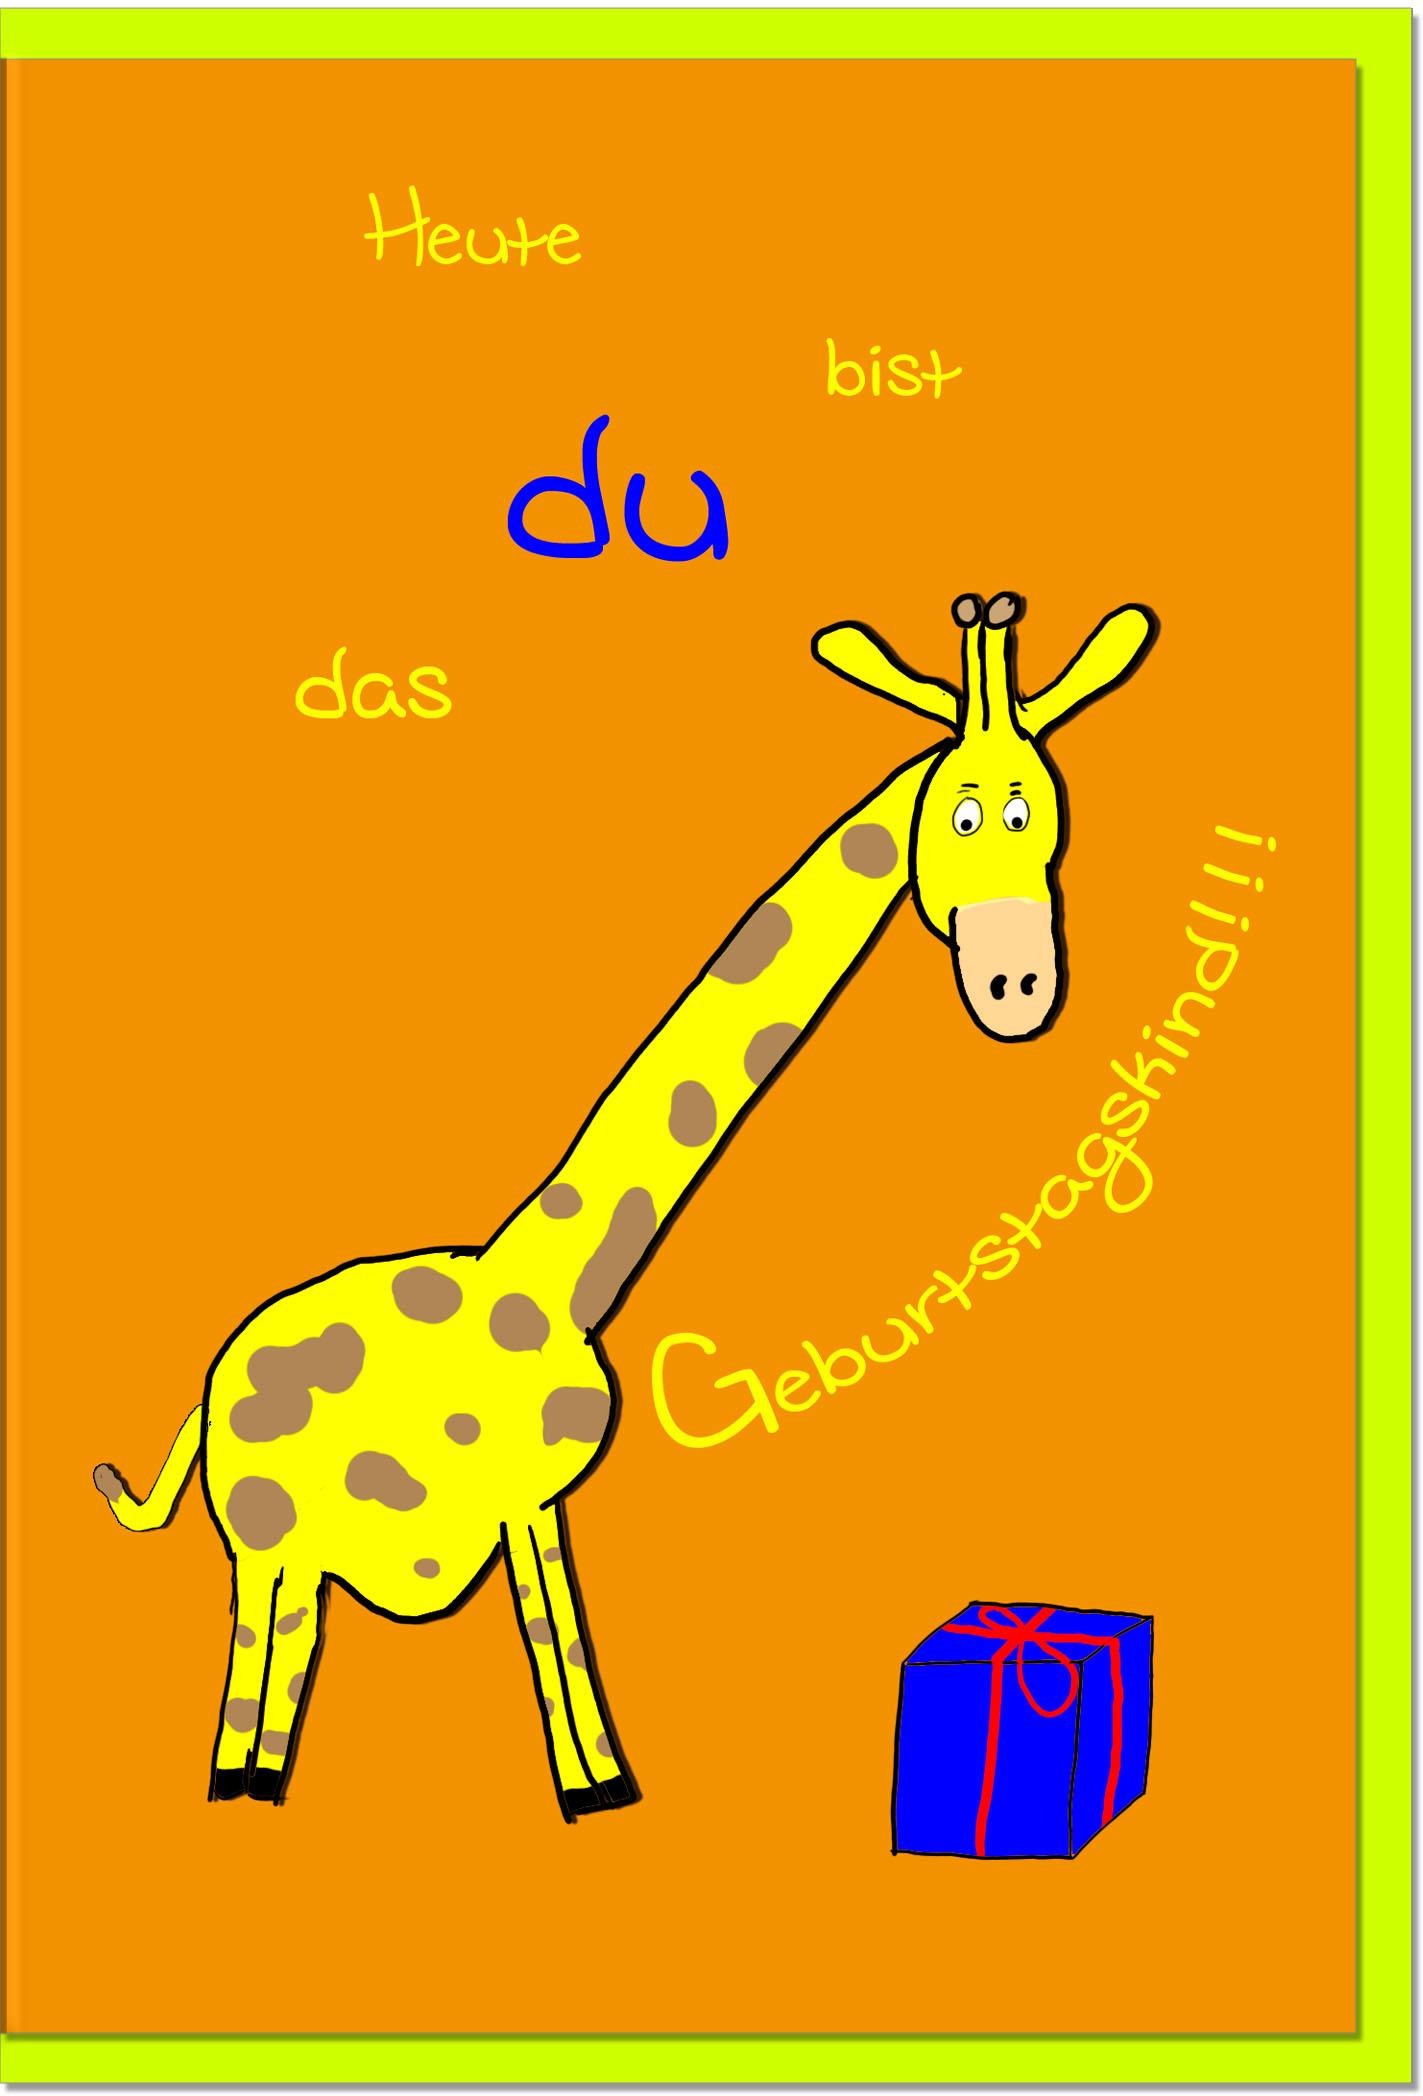 Geburtstagskarten / Grußkarten /Geburtstag Giraffe